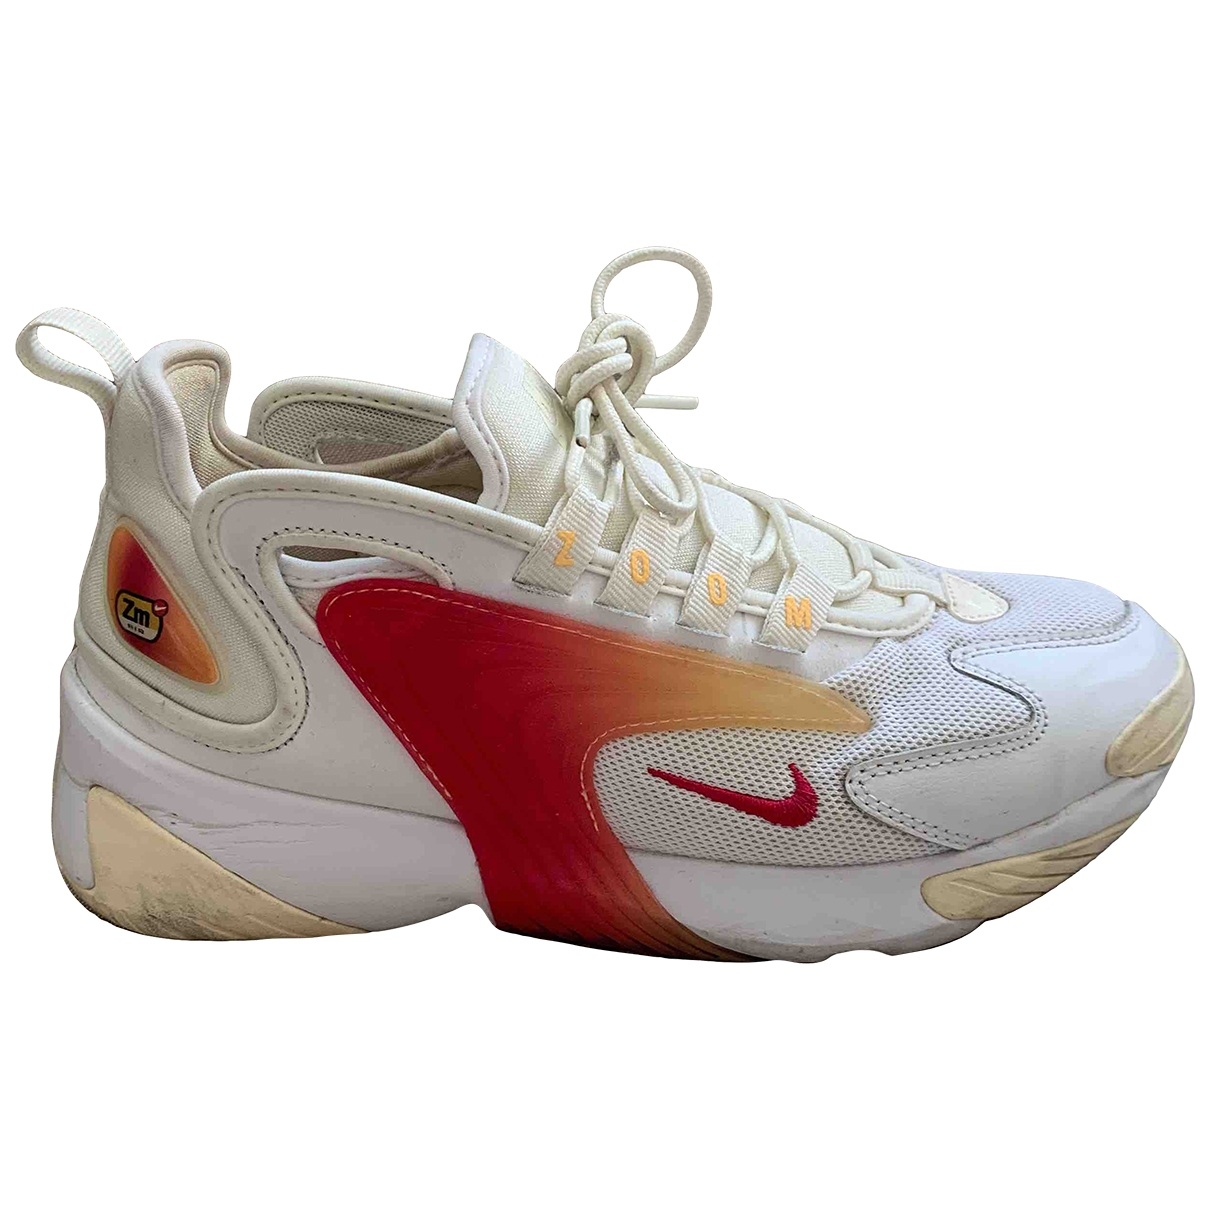 Deportivas Zoom de Lona Nike